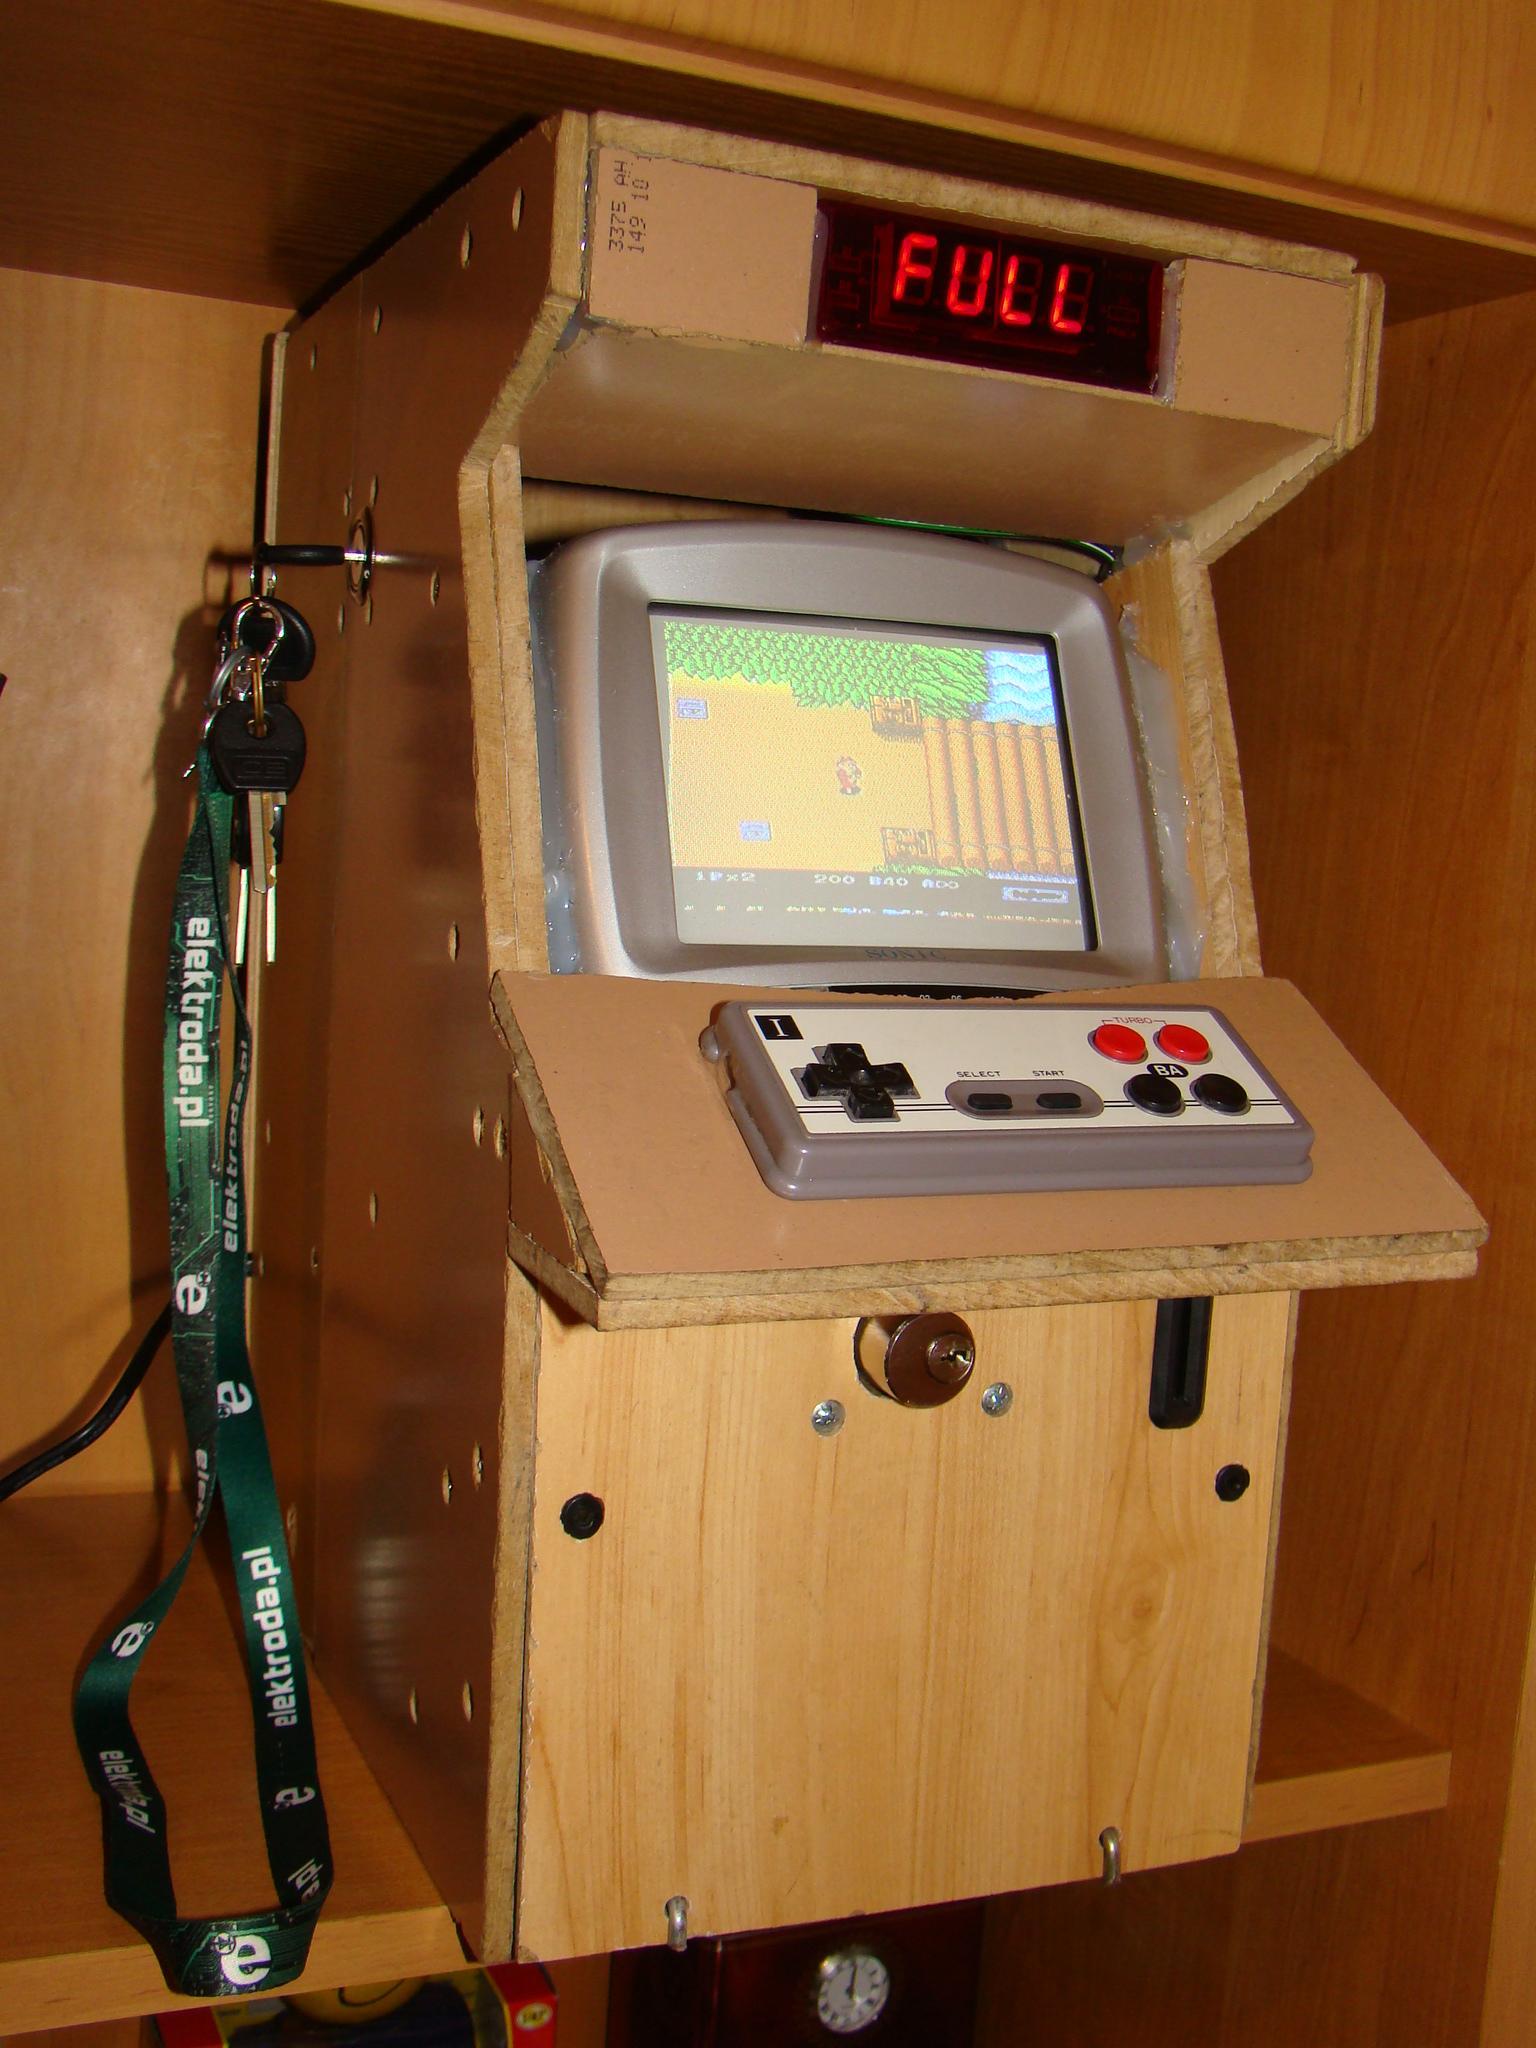 Najnowsze Automat do grania typu Arcade Game - elektroda.pl BI72